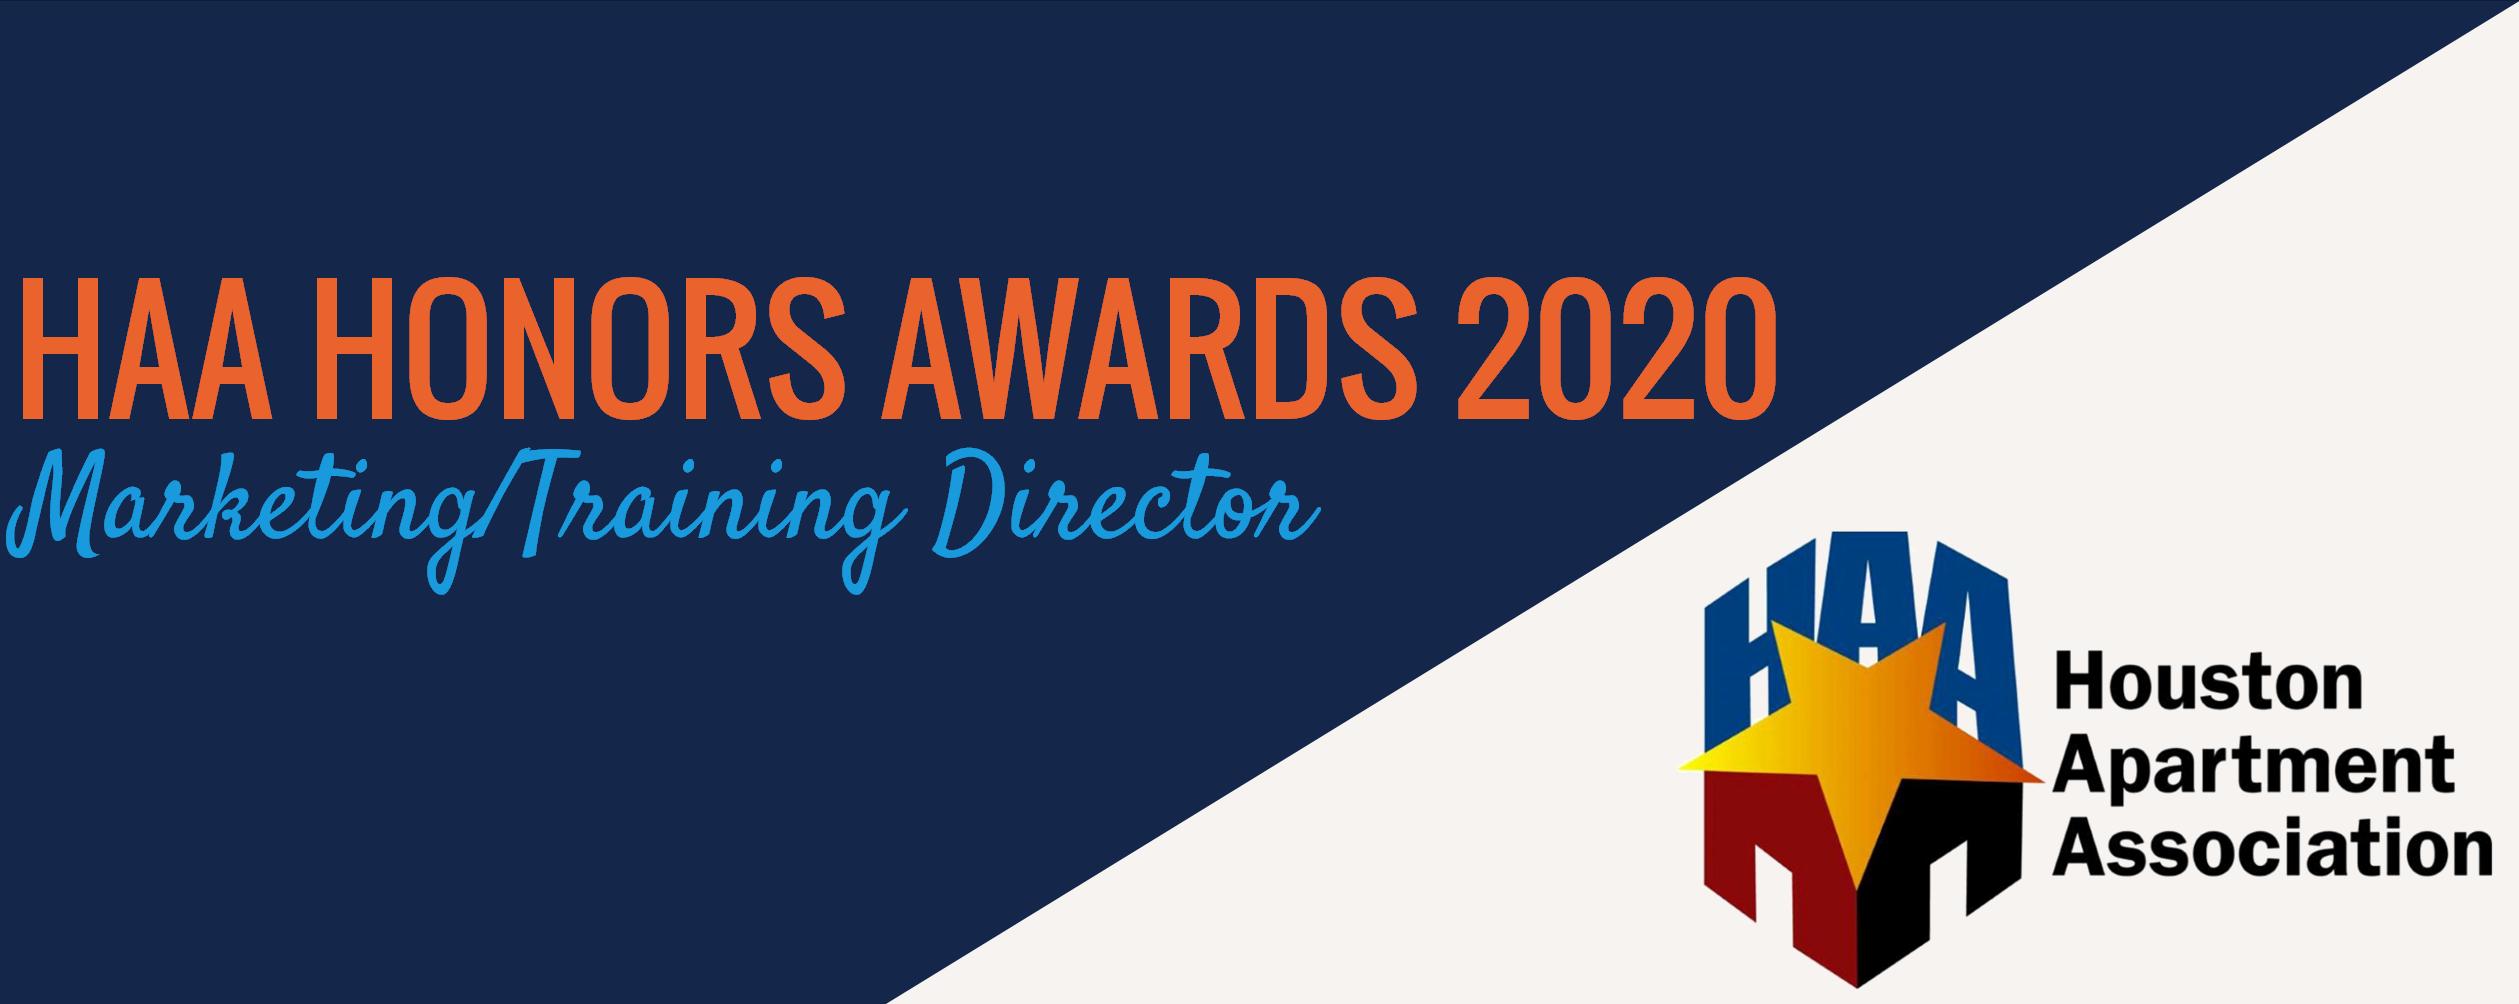 Mollie Witt Wins the HAA Marketing/Training Director Award